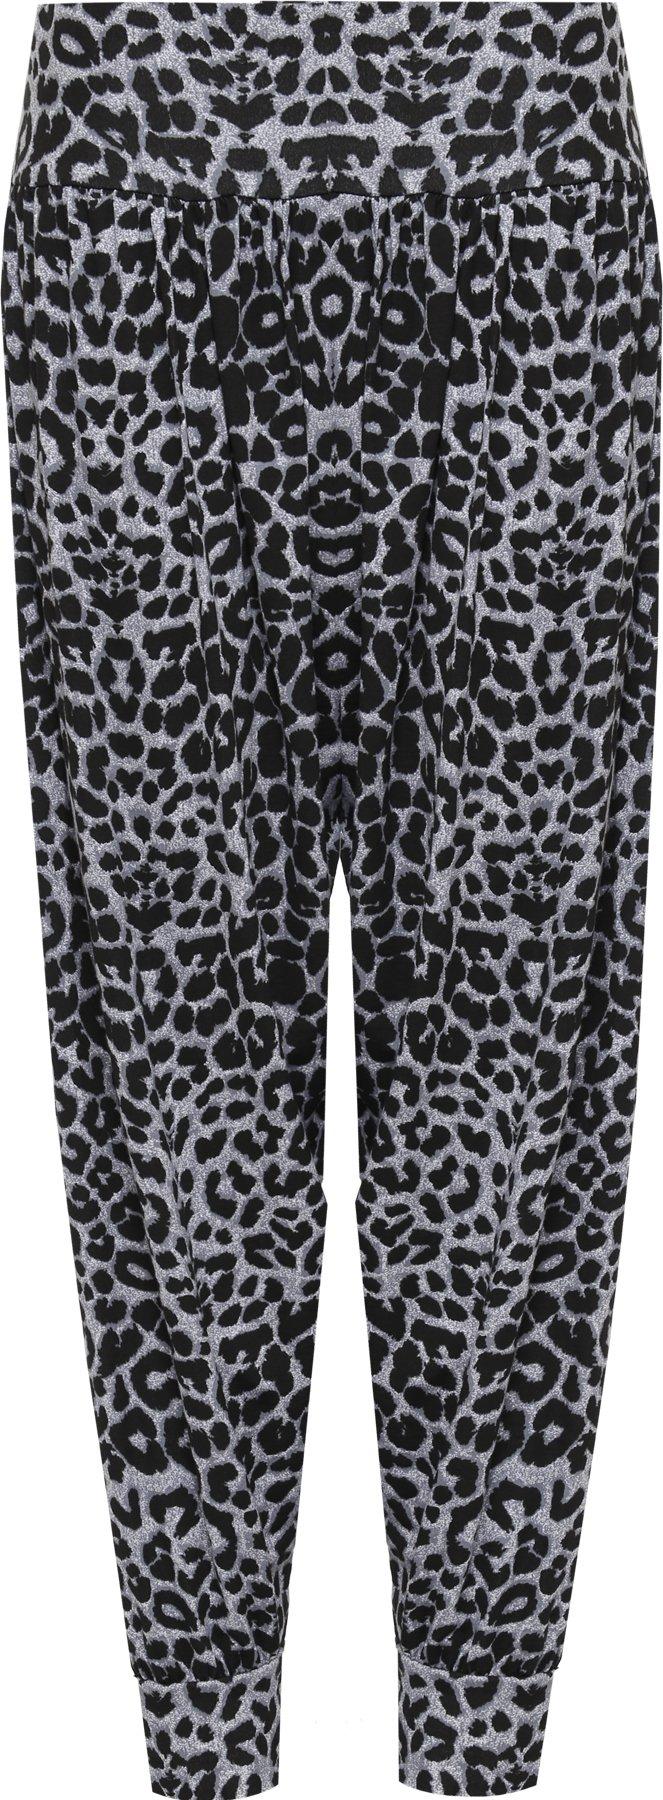 WearAll Women's Plus Size Animal Print Harem Trousers Ladies Long Pants - Gray - US 20-22 (UK 24-26)